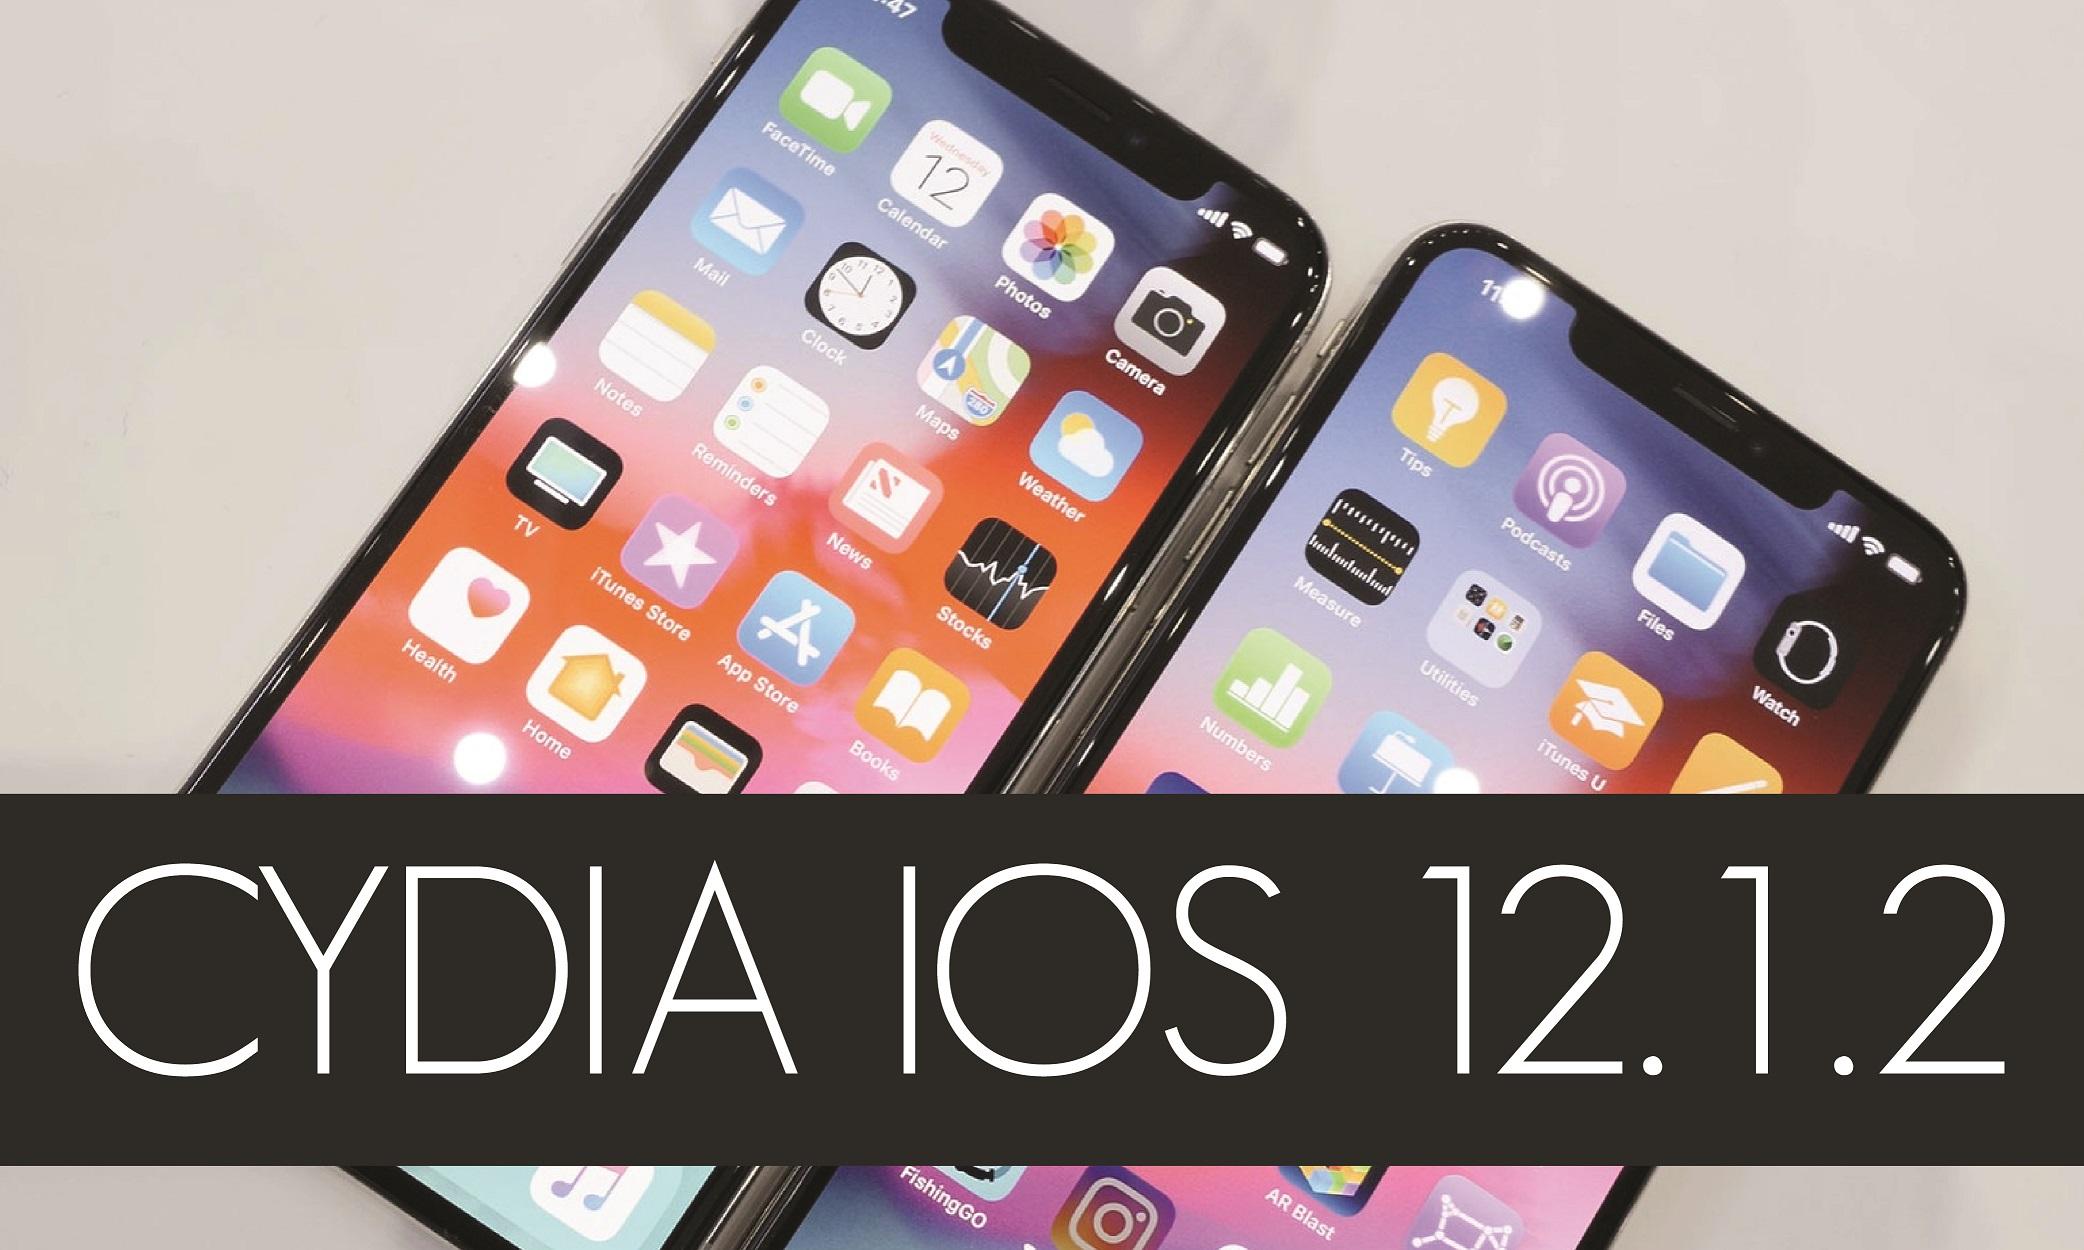 cydia ios 12.1.2